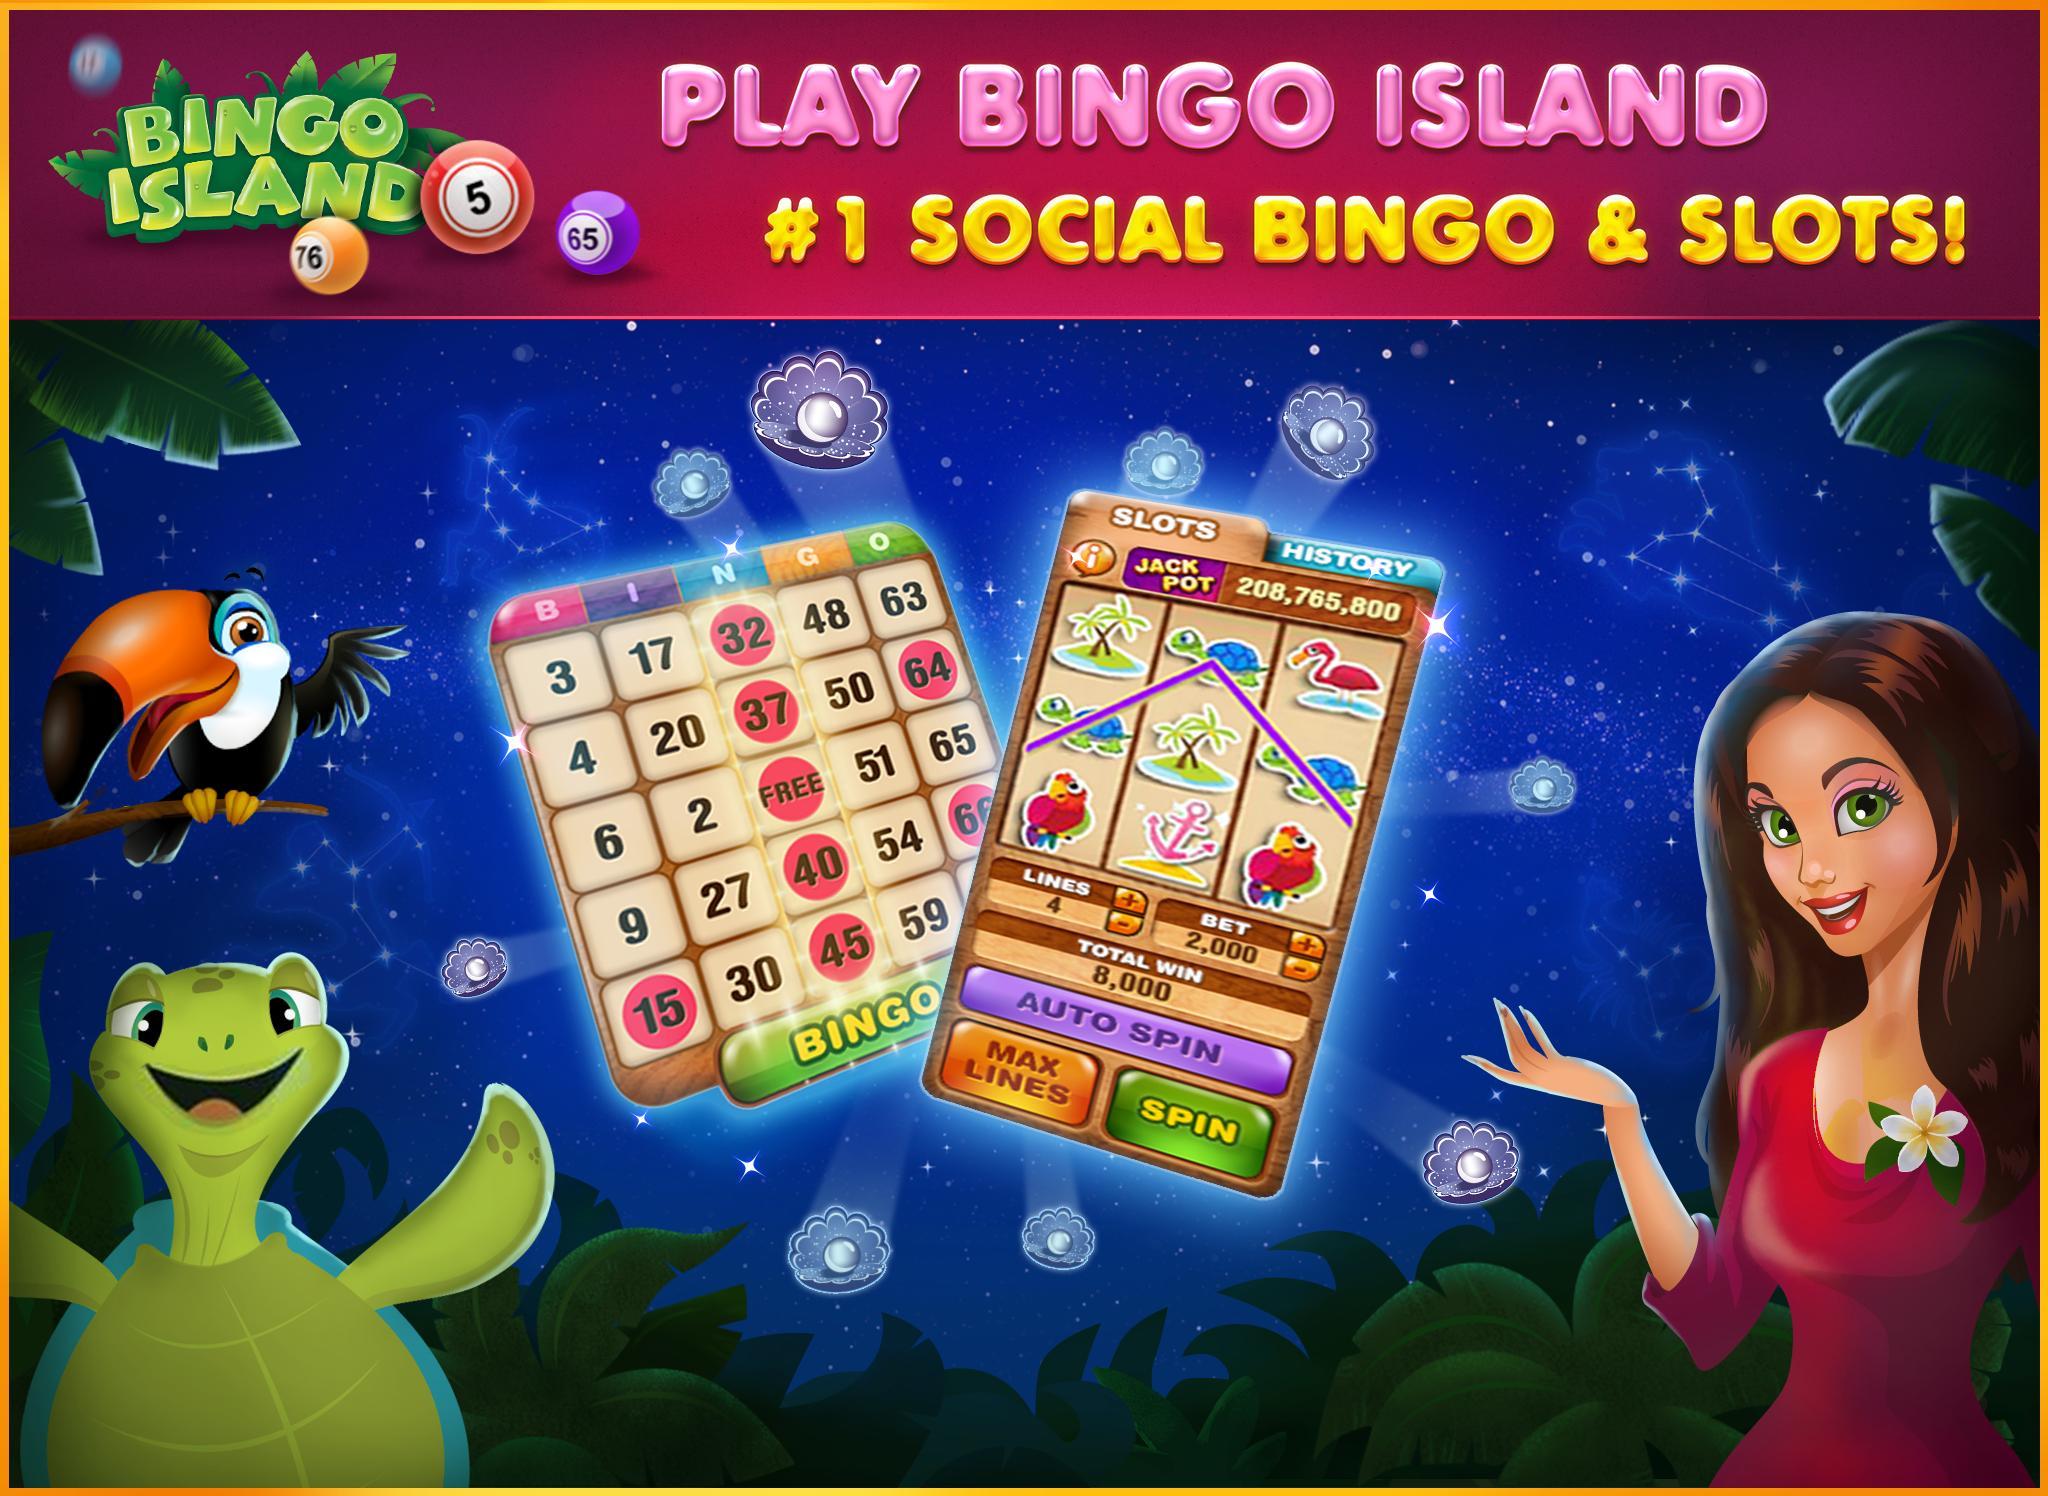 Bingo Island Free Bingo Slots For Android Apk Download